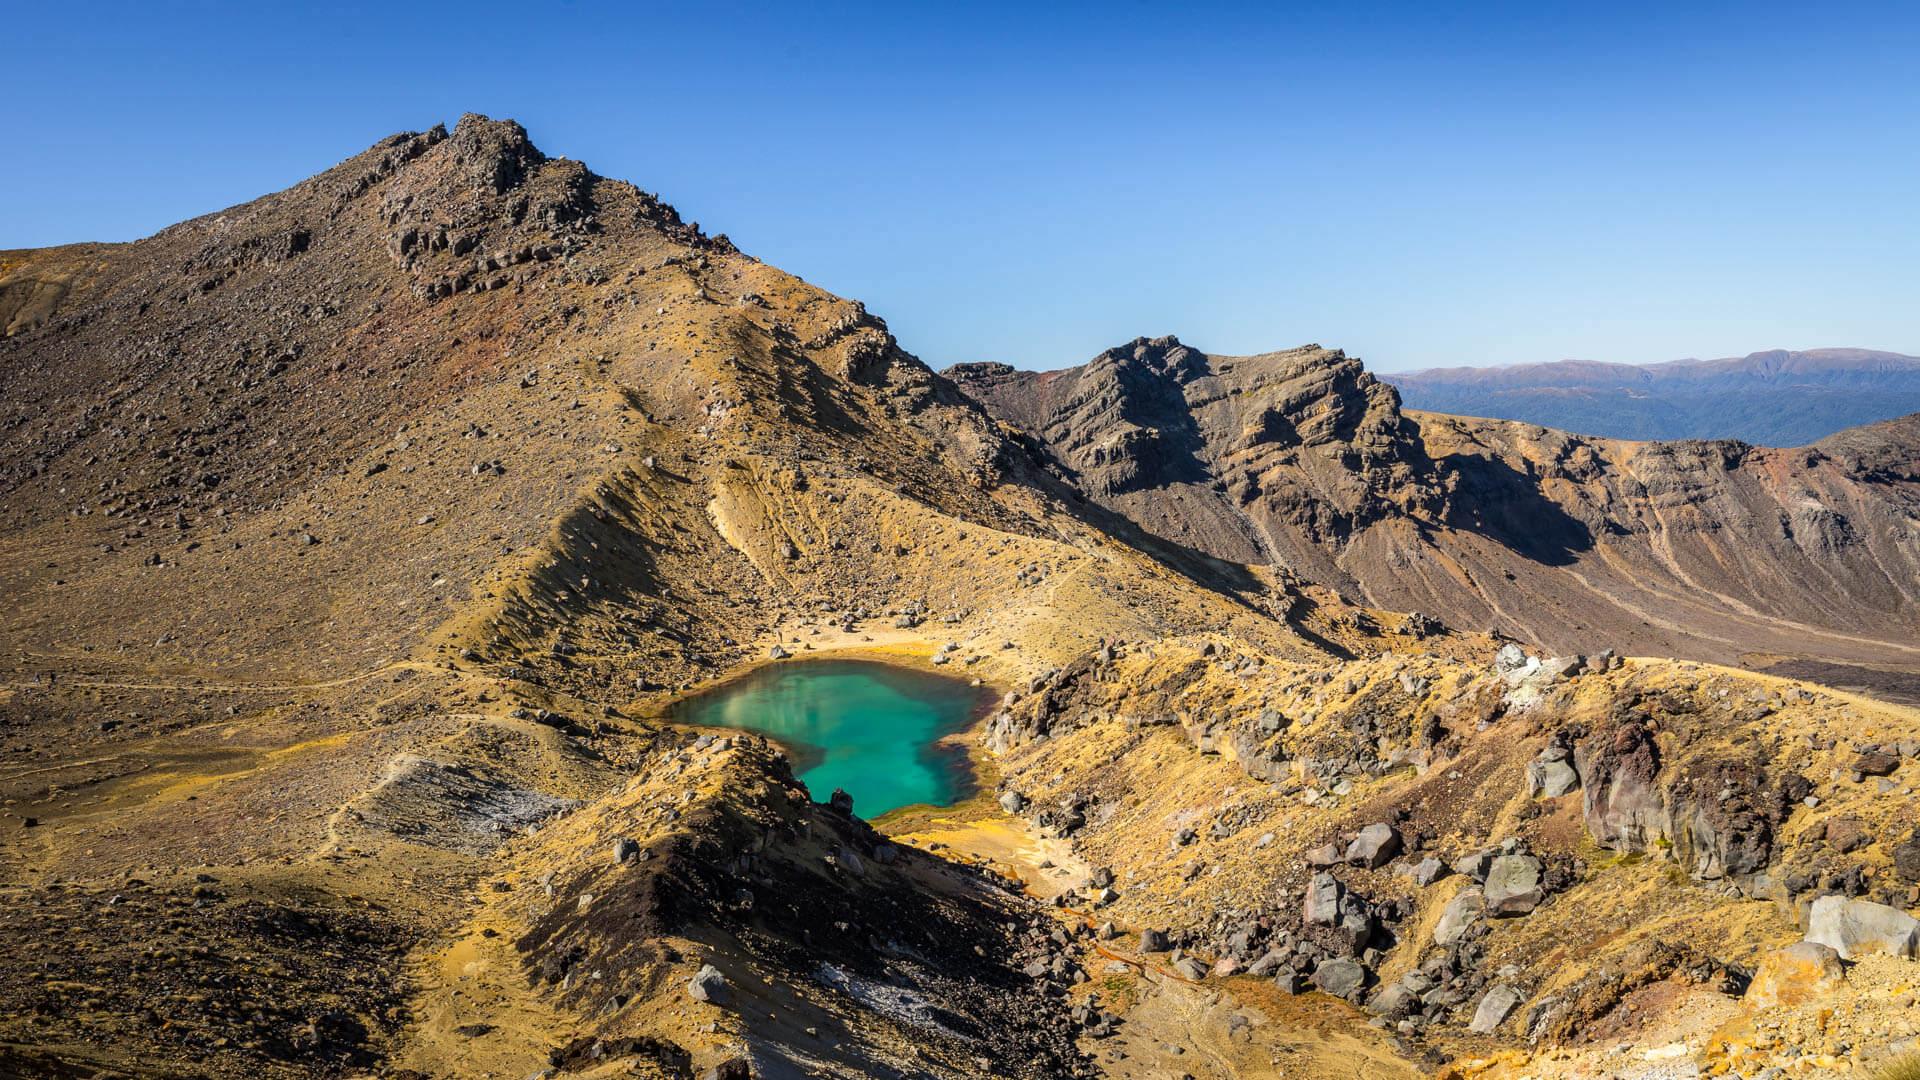 Blue lake, Tongariro Alpine Crossing